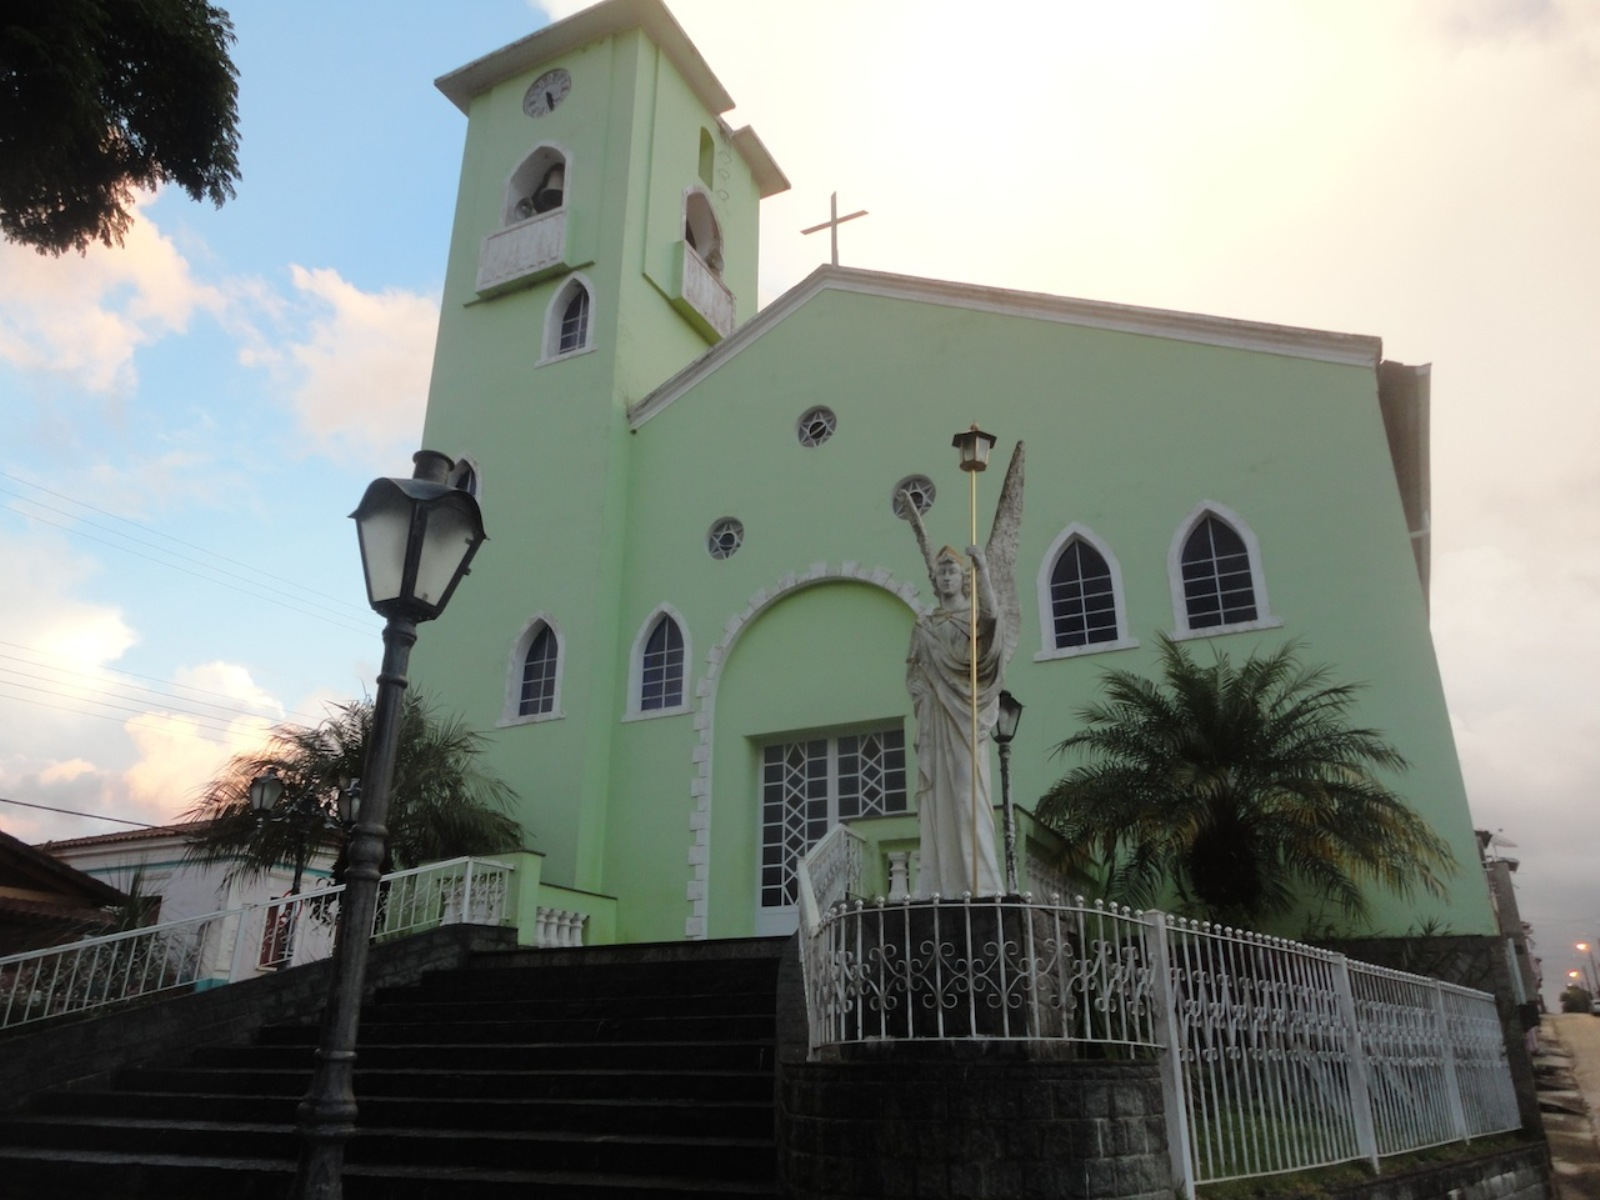 igreja-sa%cc%83o-sebastia%cc%83o-luiz-gustavo-miguez